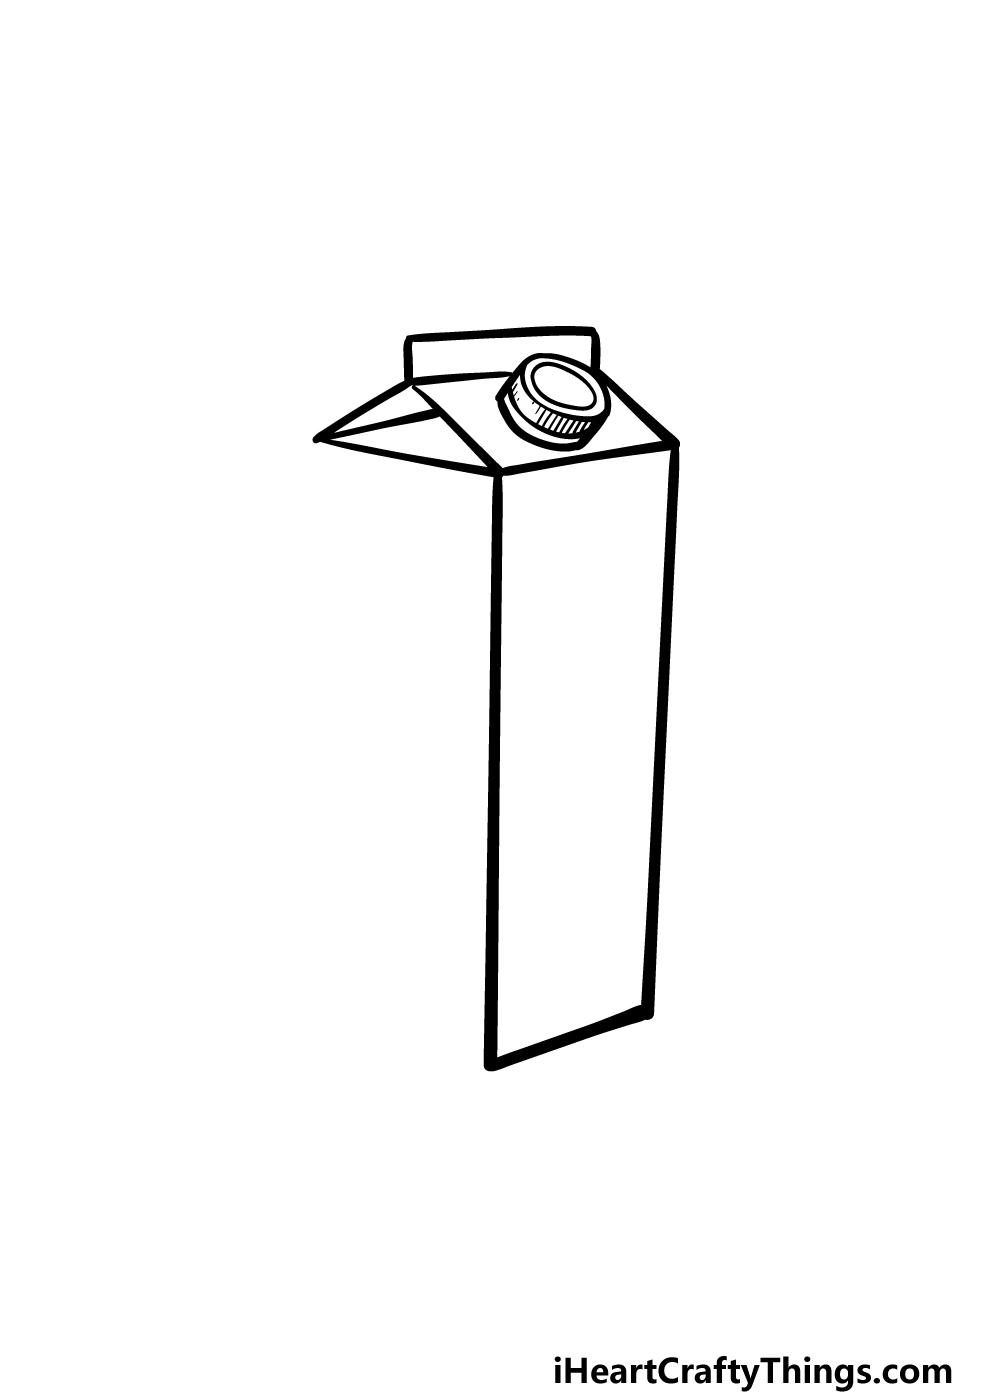 drawing a milk carton step 3